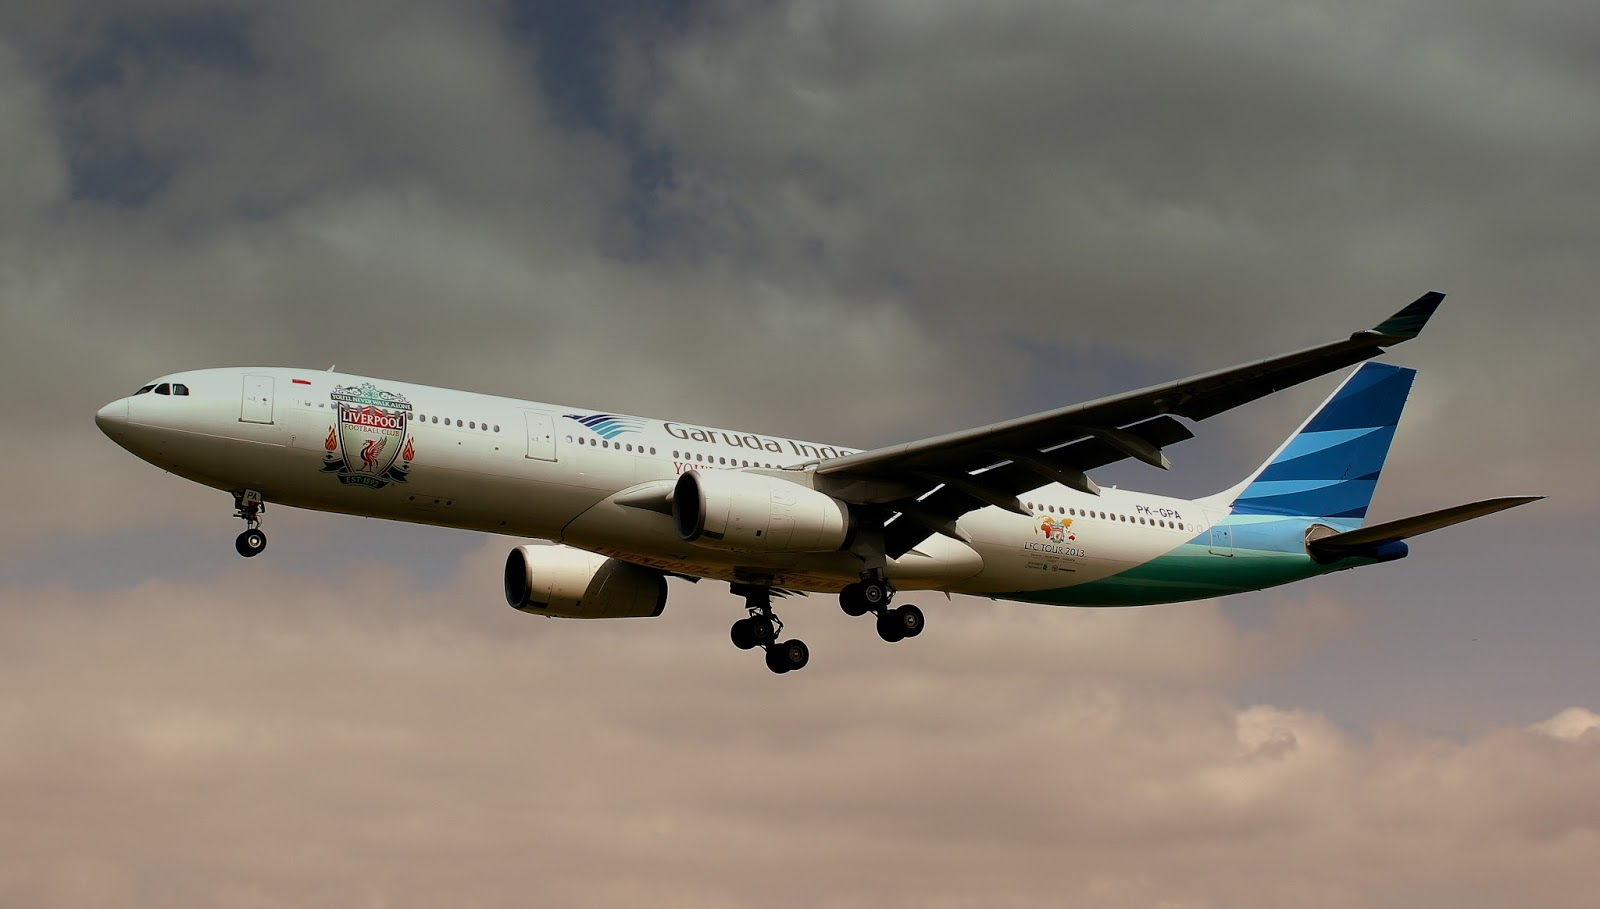 Garuda Indonesia Airbus A330 300 With Liverpool Fc Painting Motiveaircraft Wallpaper 3846 Aeronef Net